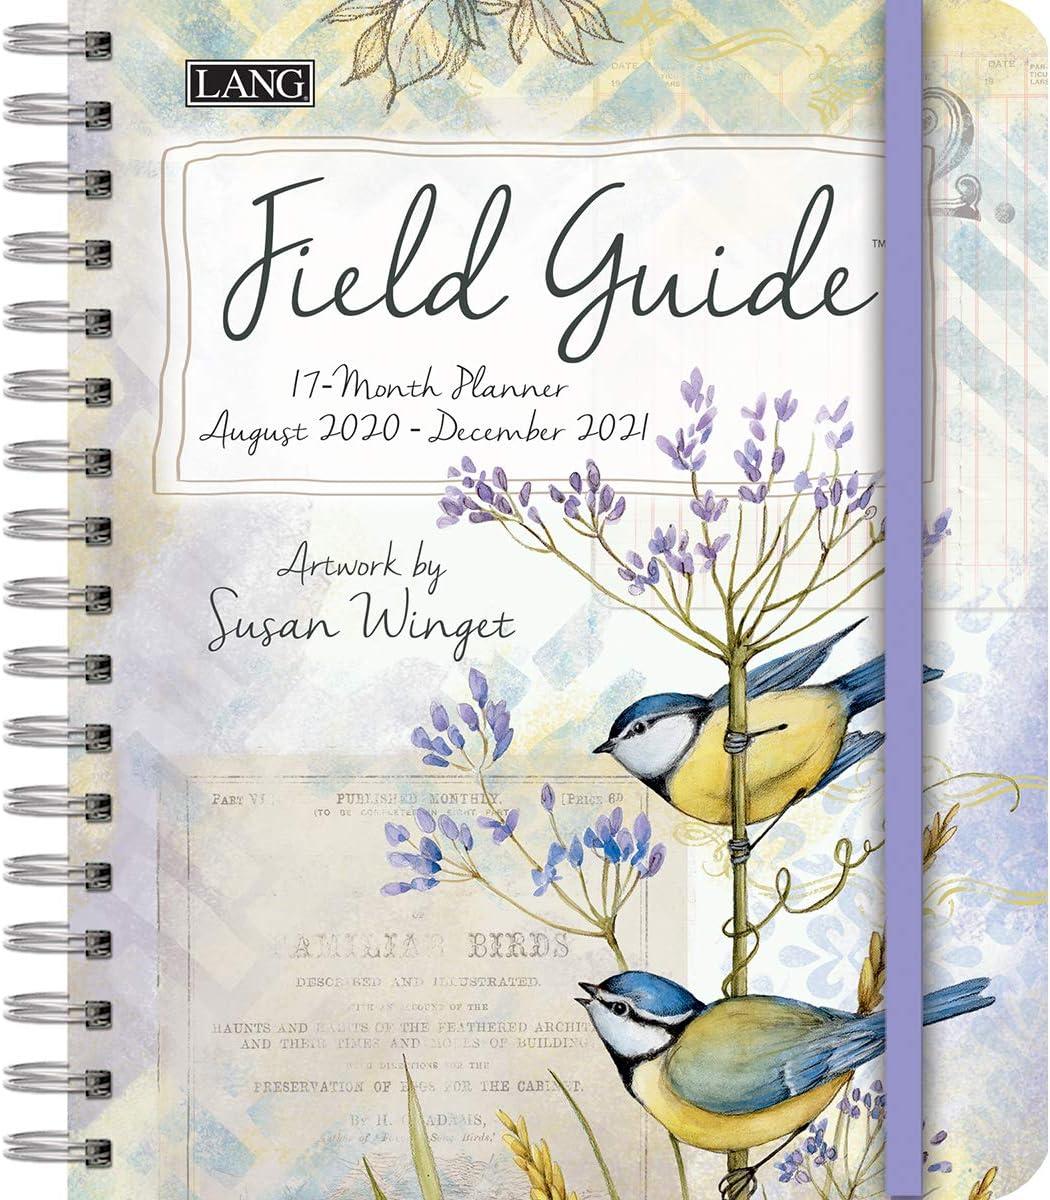 Lang Field Guide 2021 Deluxe Planner (21991038103)